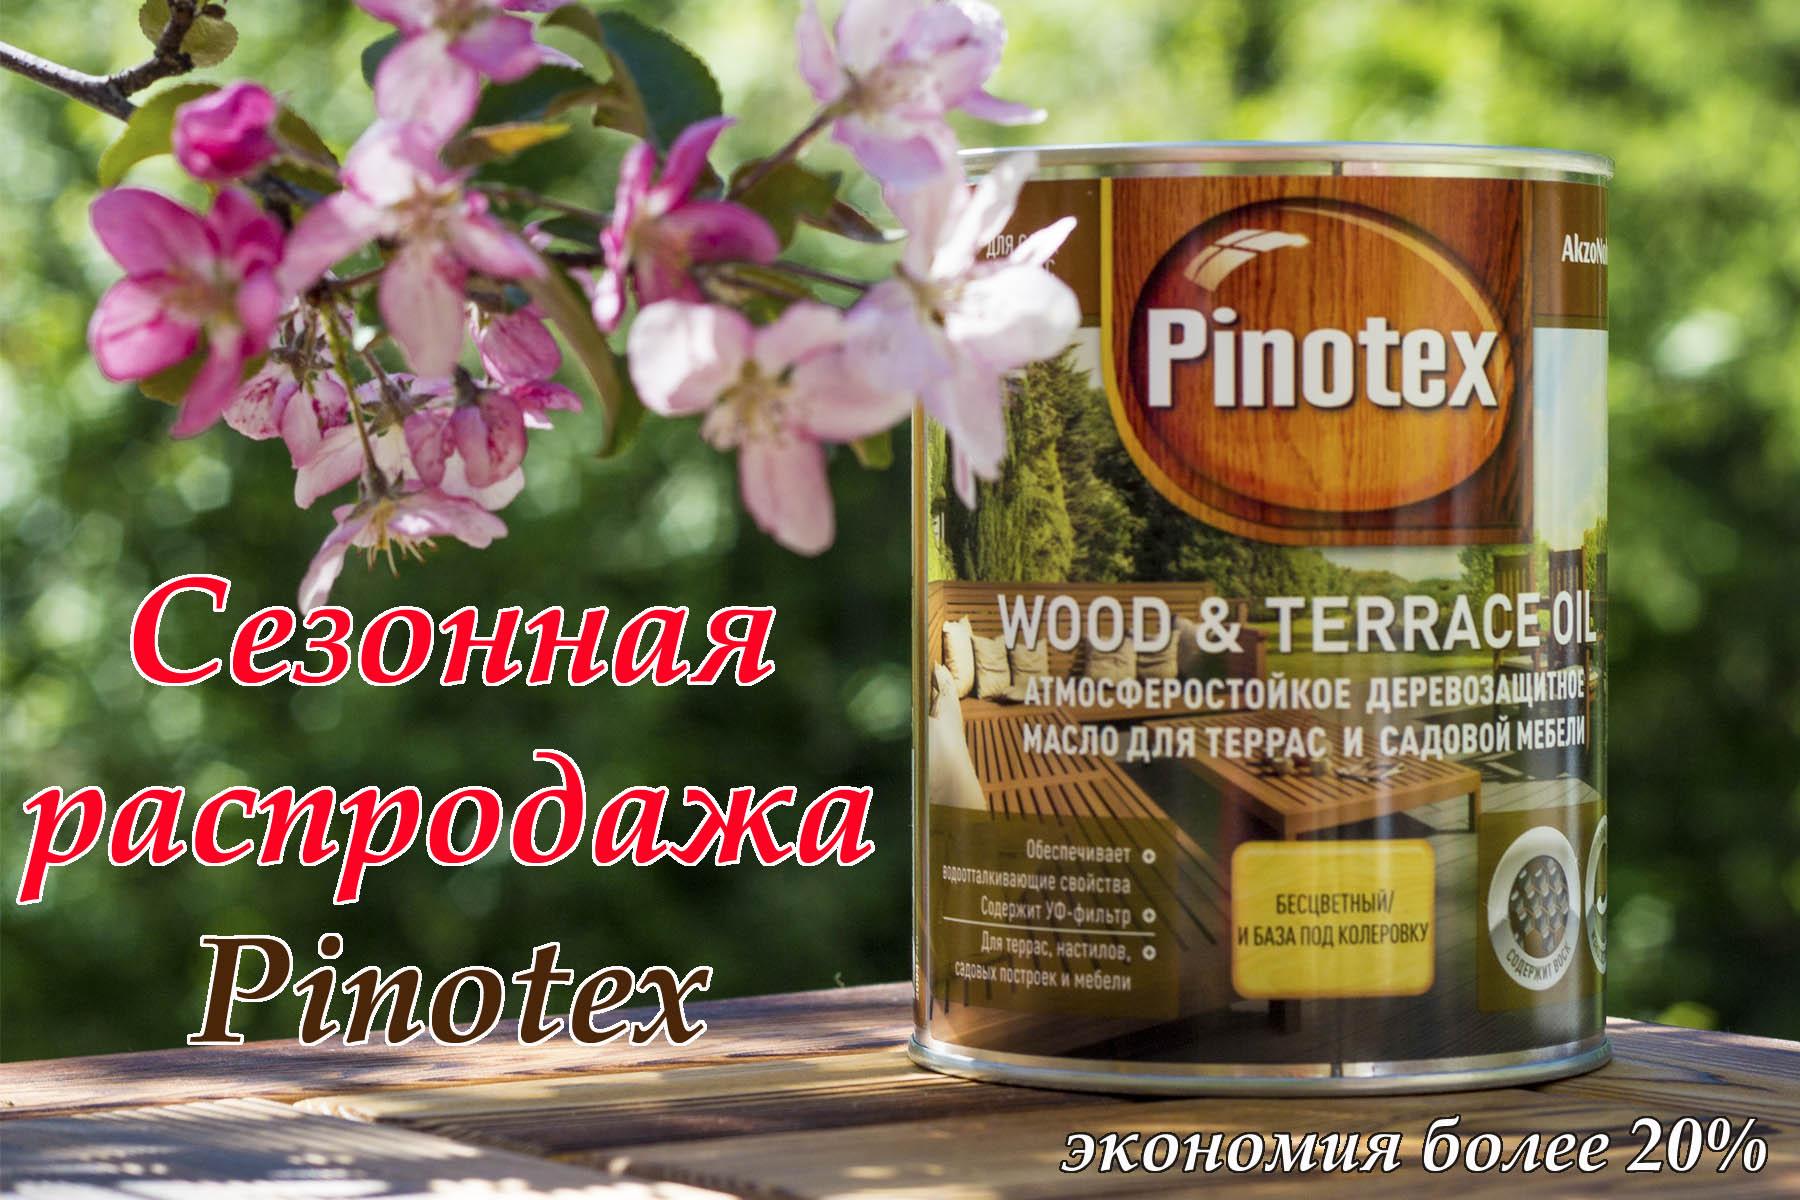 Распродажа Pinotex